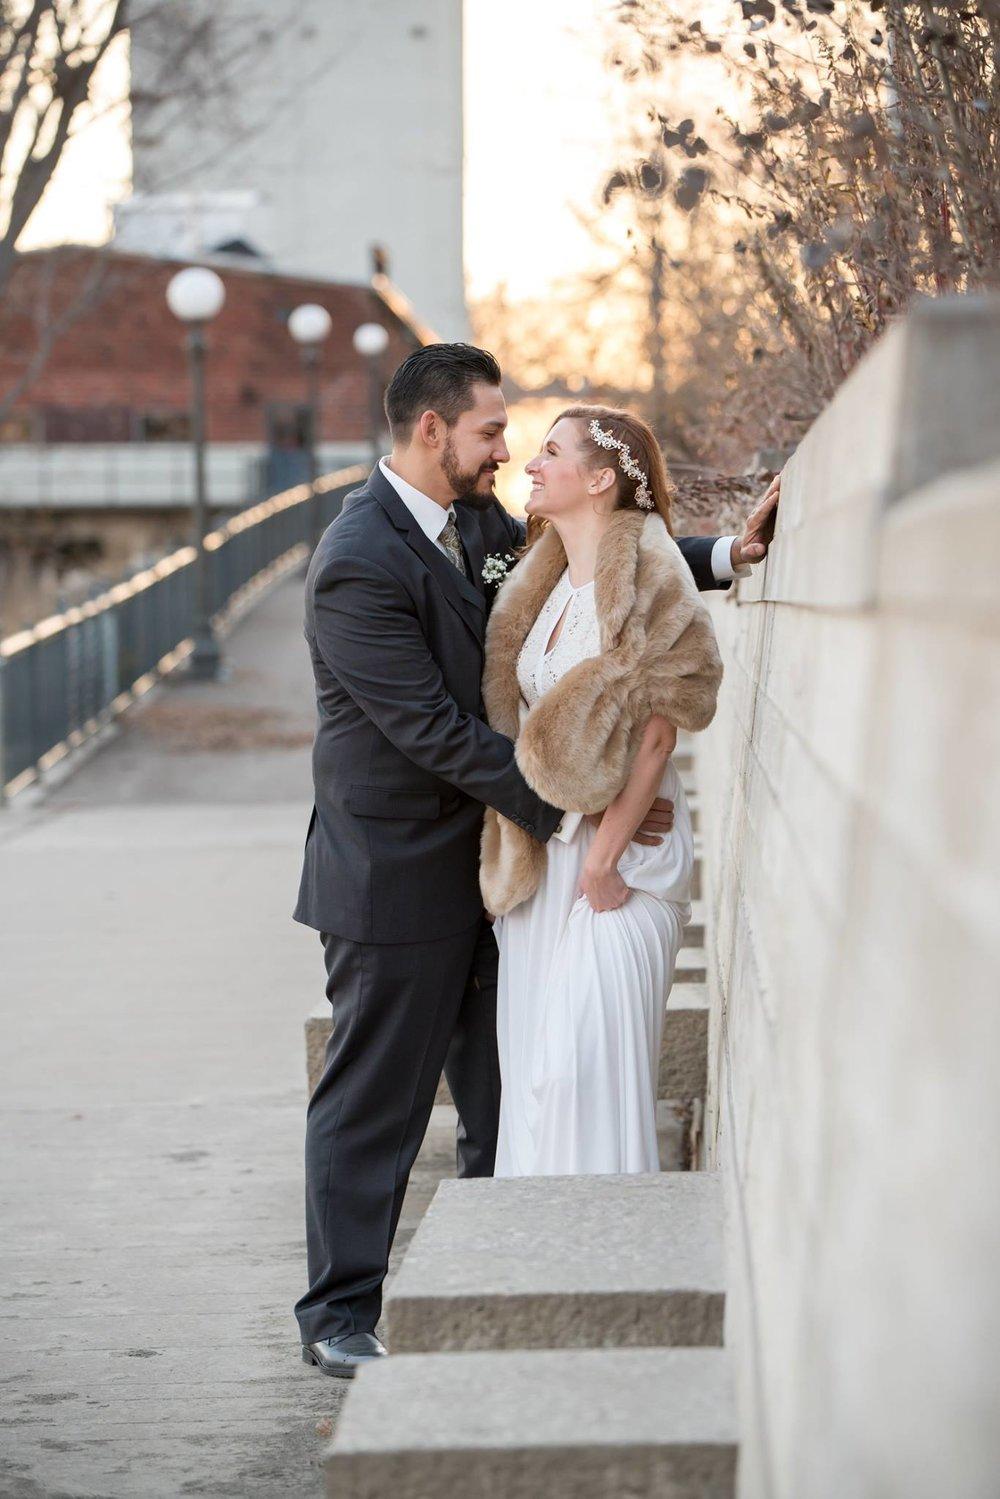 Danielle Albrecht all inclusive wedding photographer for fab weddings, winter wedding